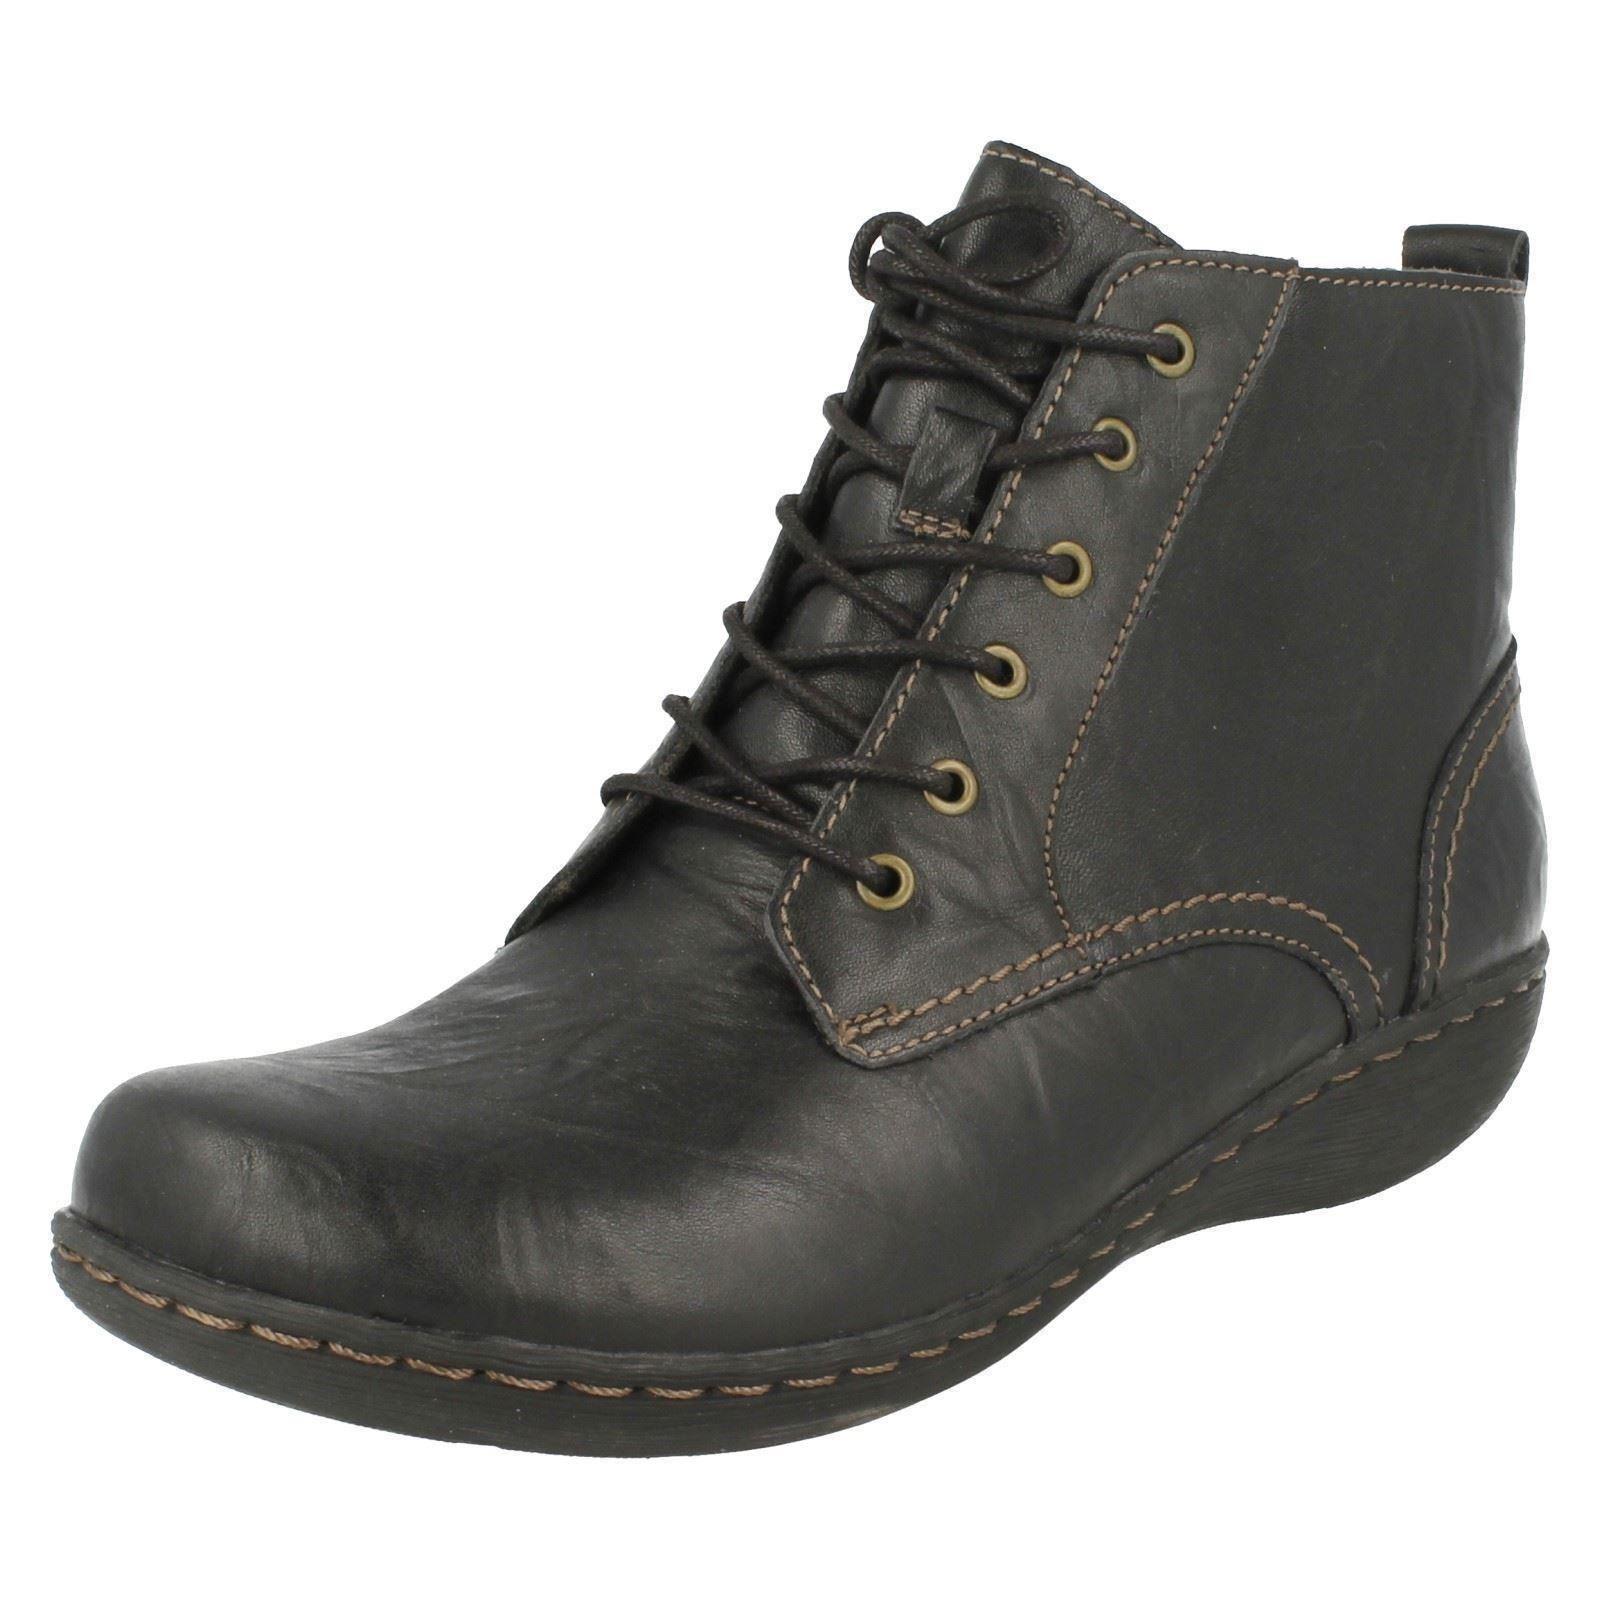 clarks ankle boots fianna ebay